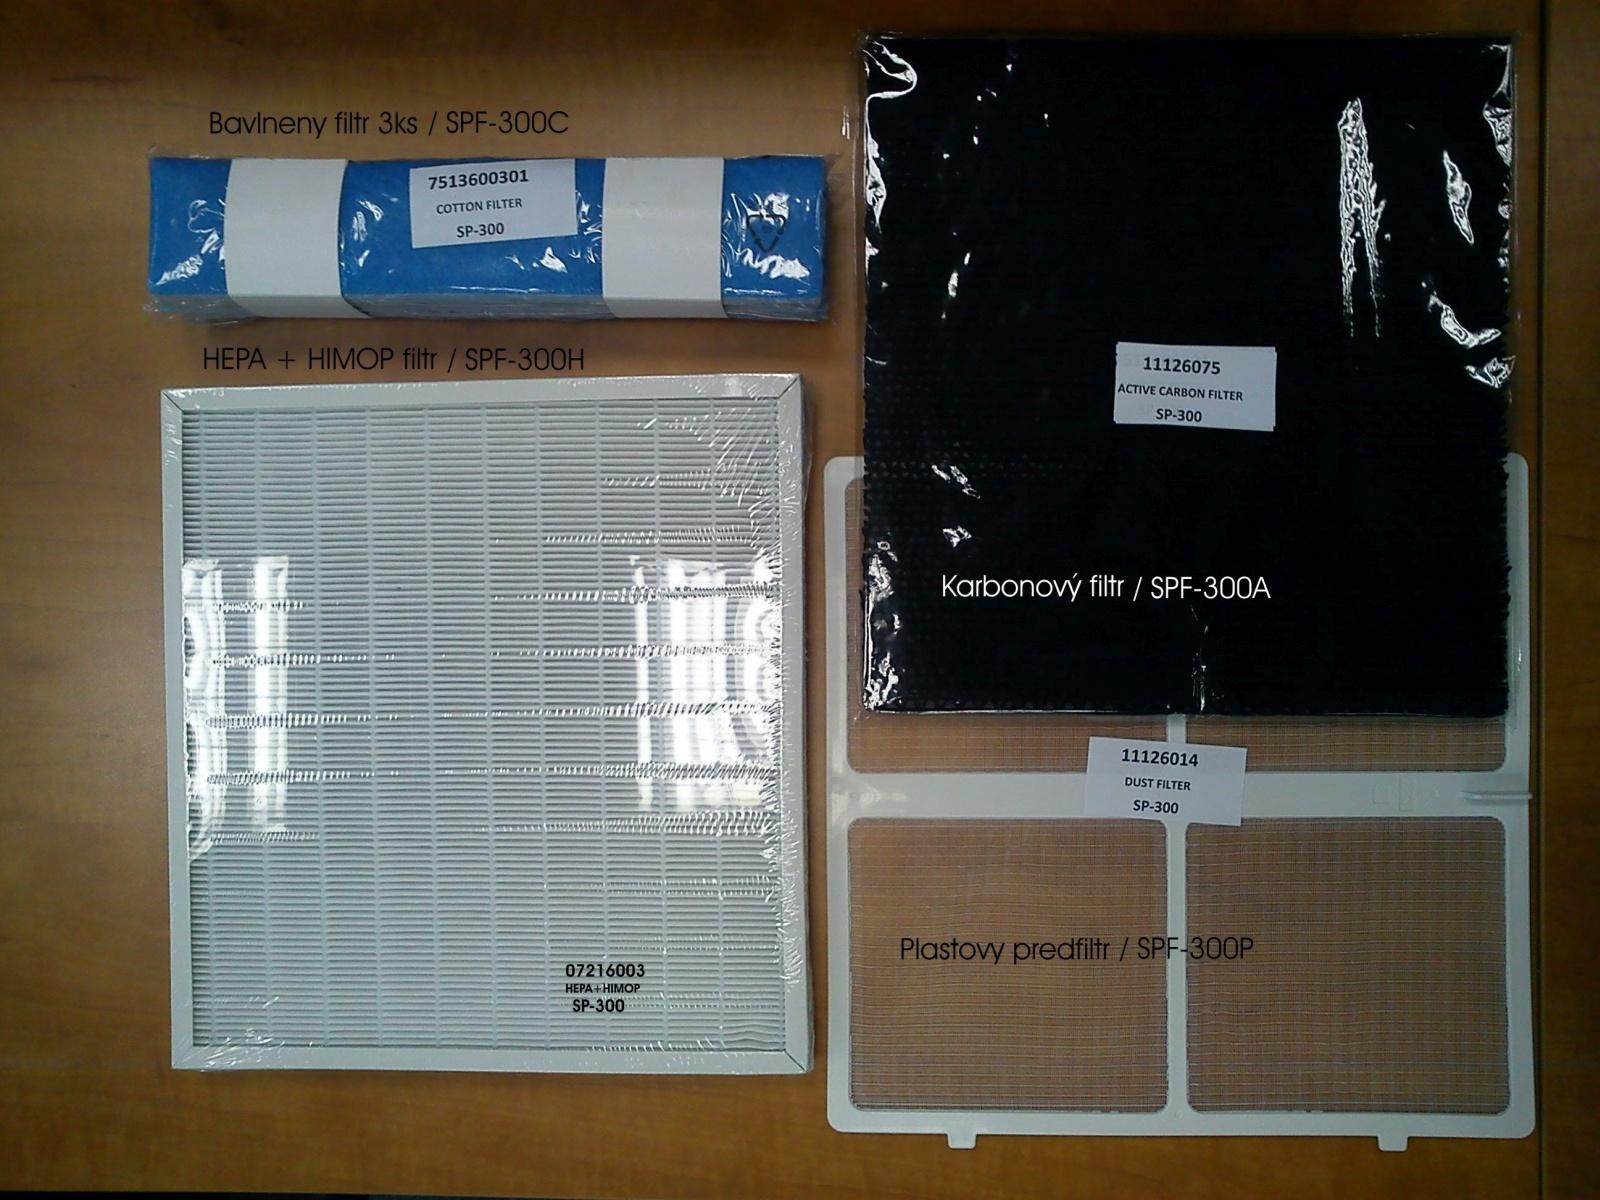 Sada filtrů pro Sinclair SP-300A